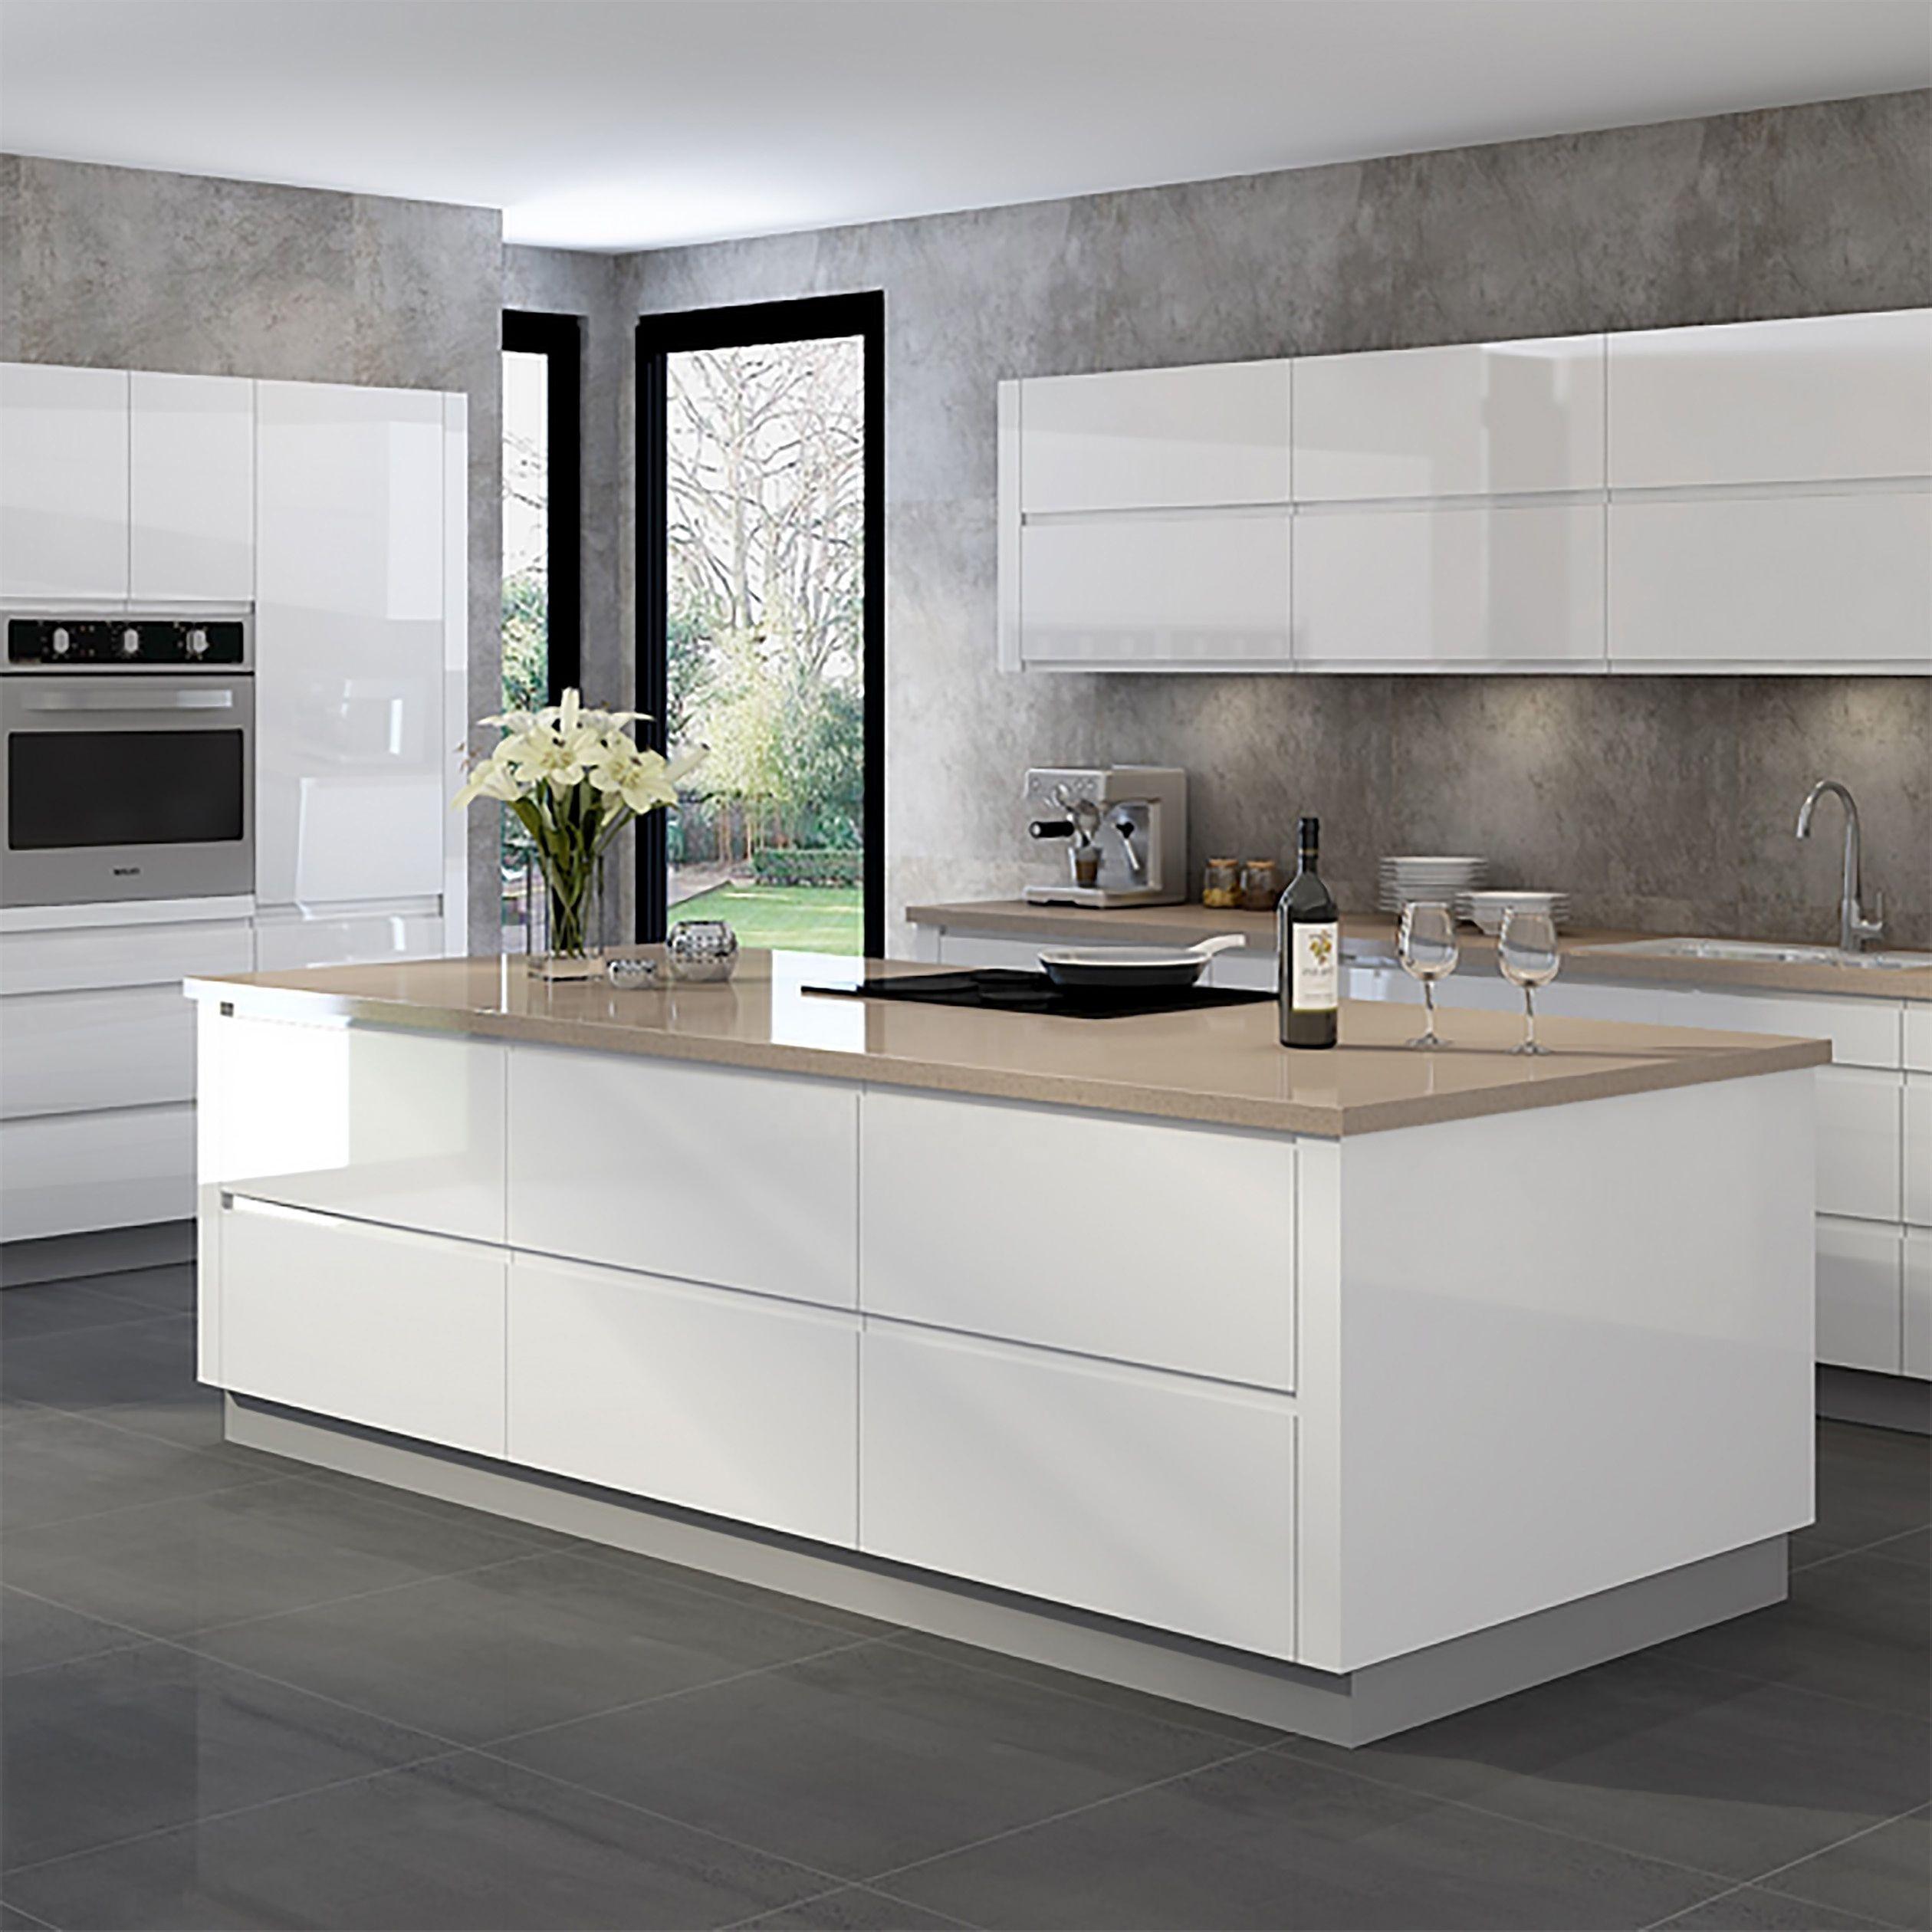 Vermonhouzz Luxury High Gloss Modern Design White Lacquer